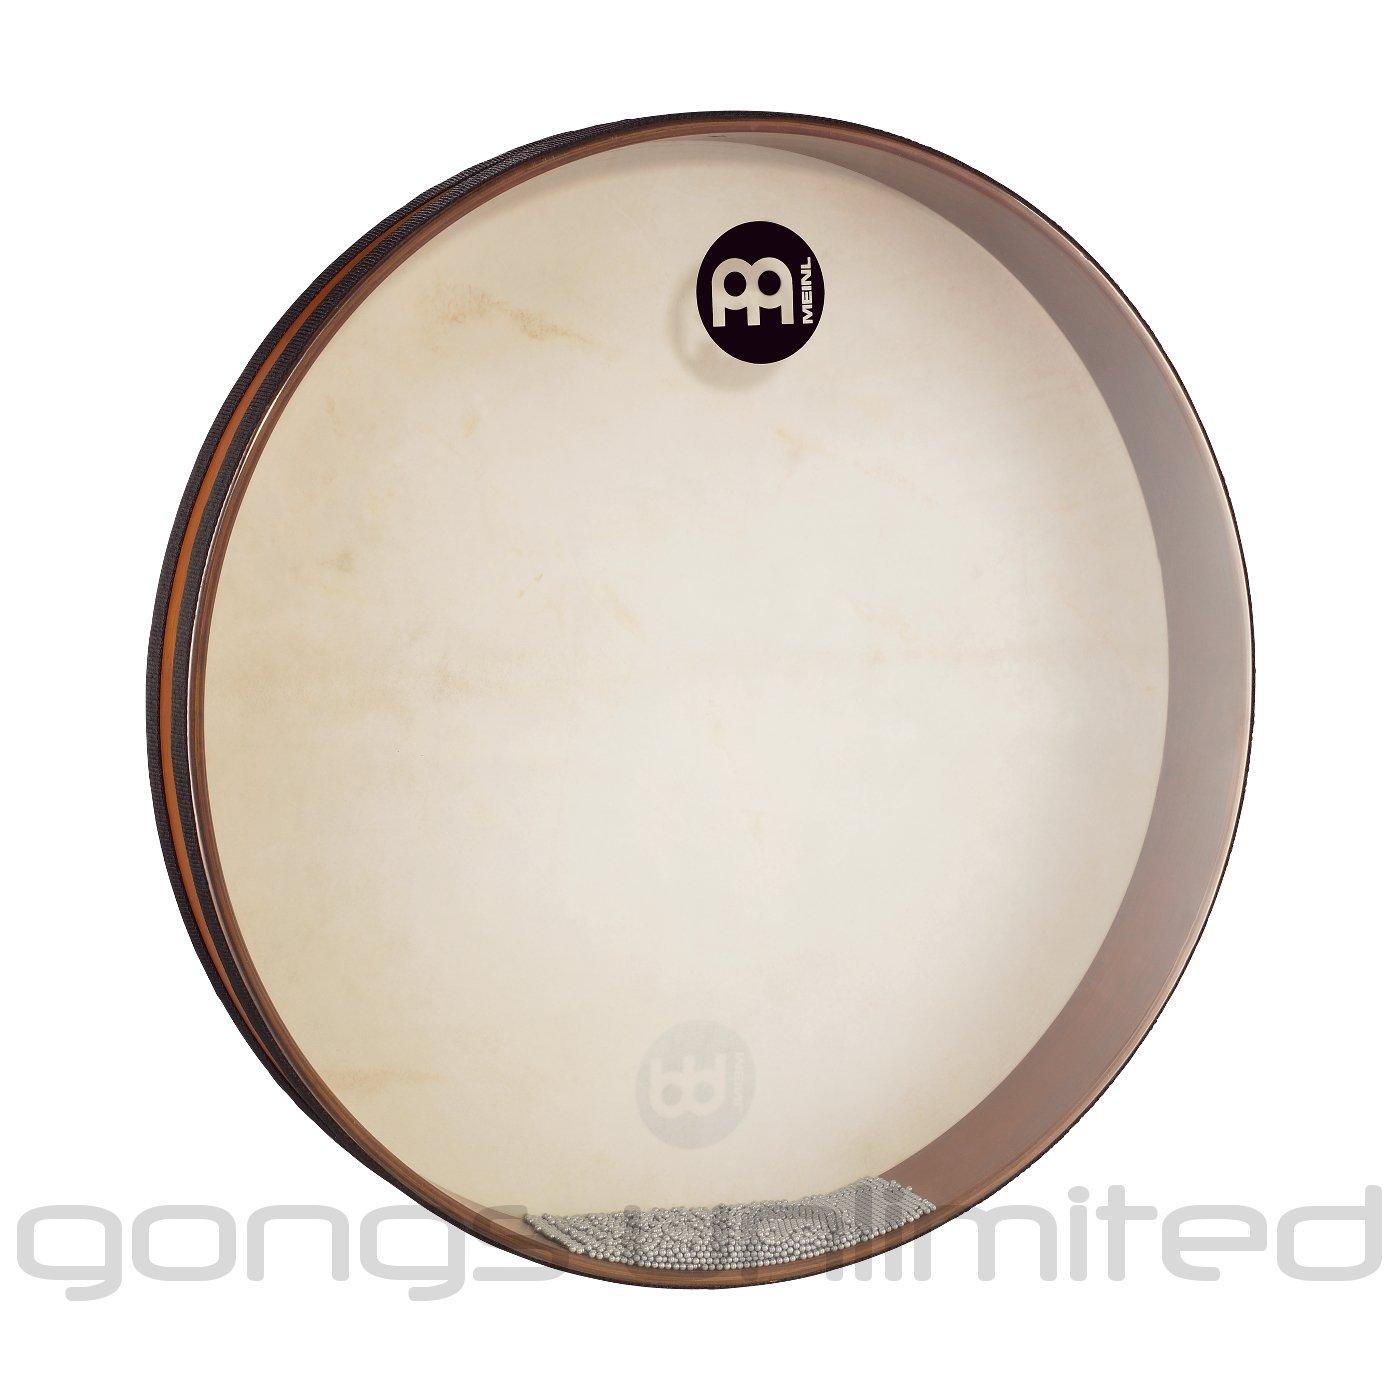 Meinl Wave Drums